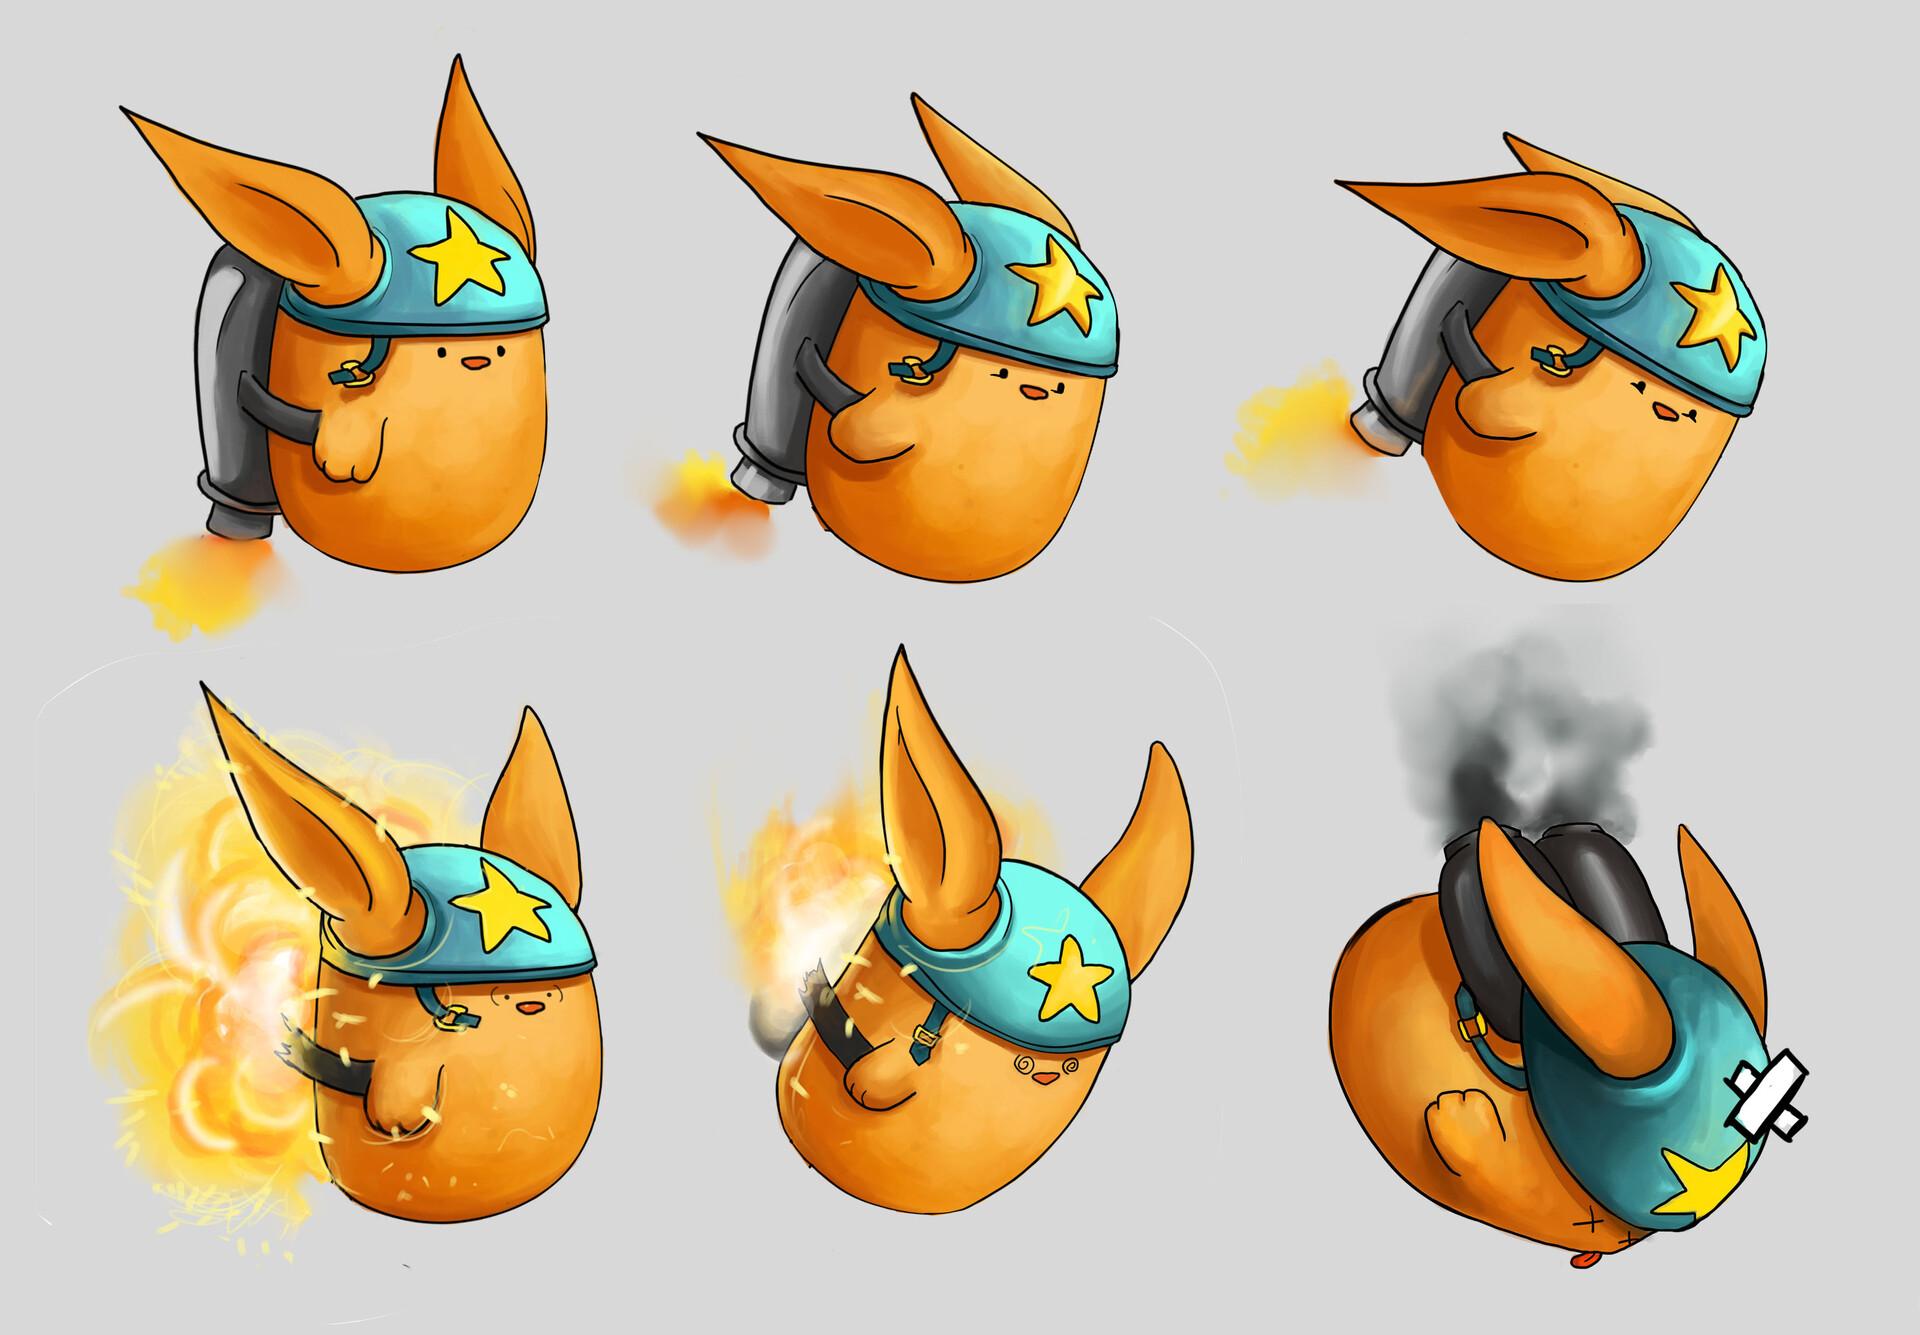 Shellz art piff animation concepts